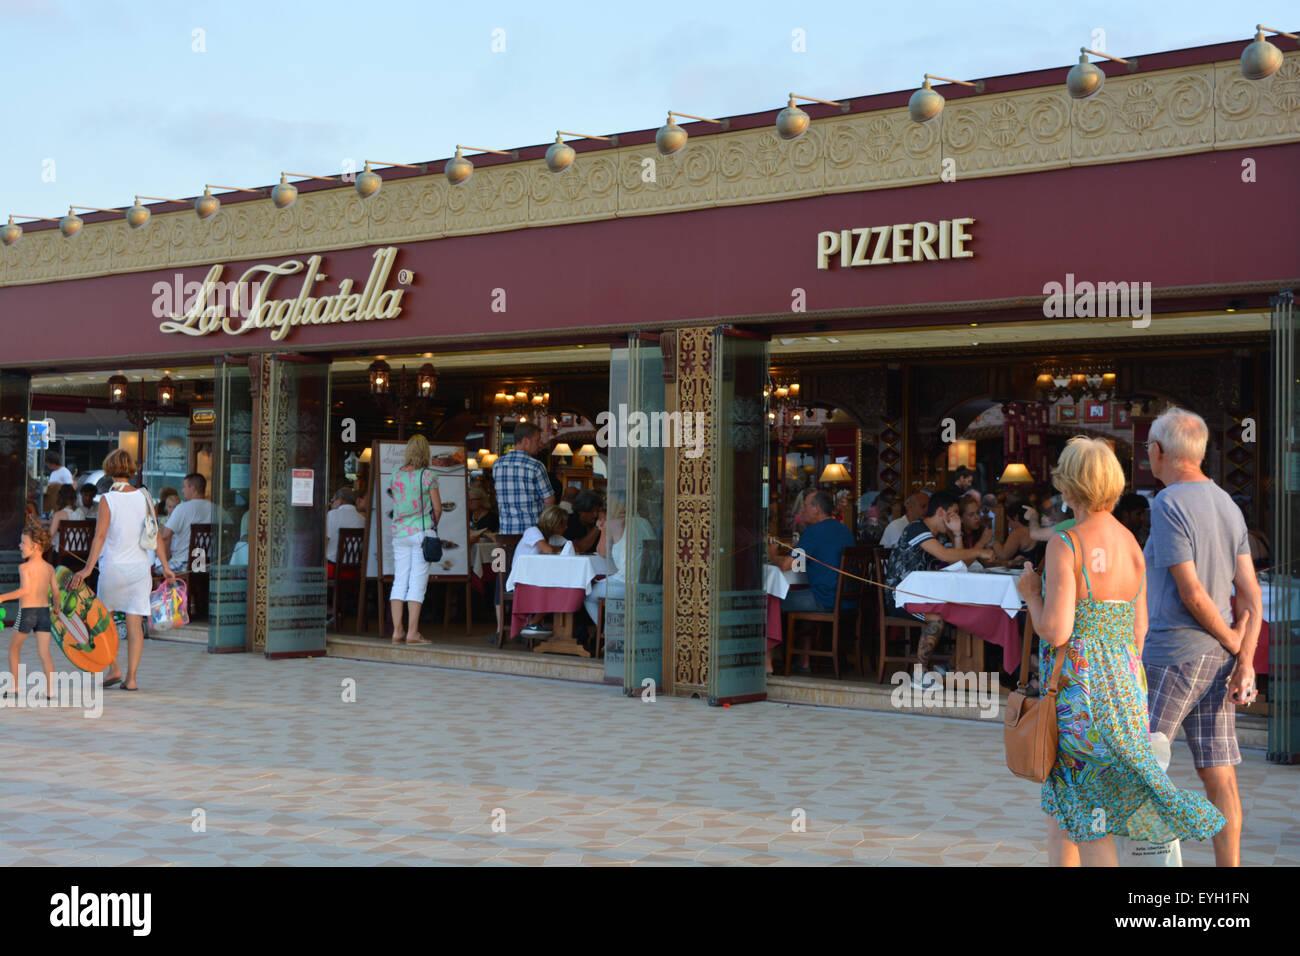 Pizza La Stock Photos & Pizza La Stock Images - Alamy